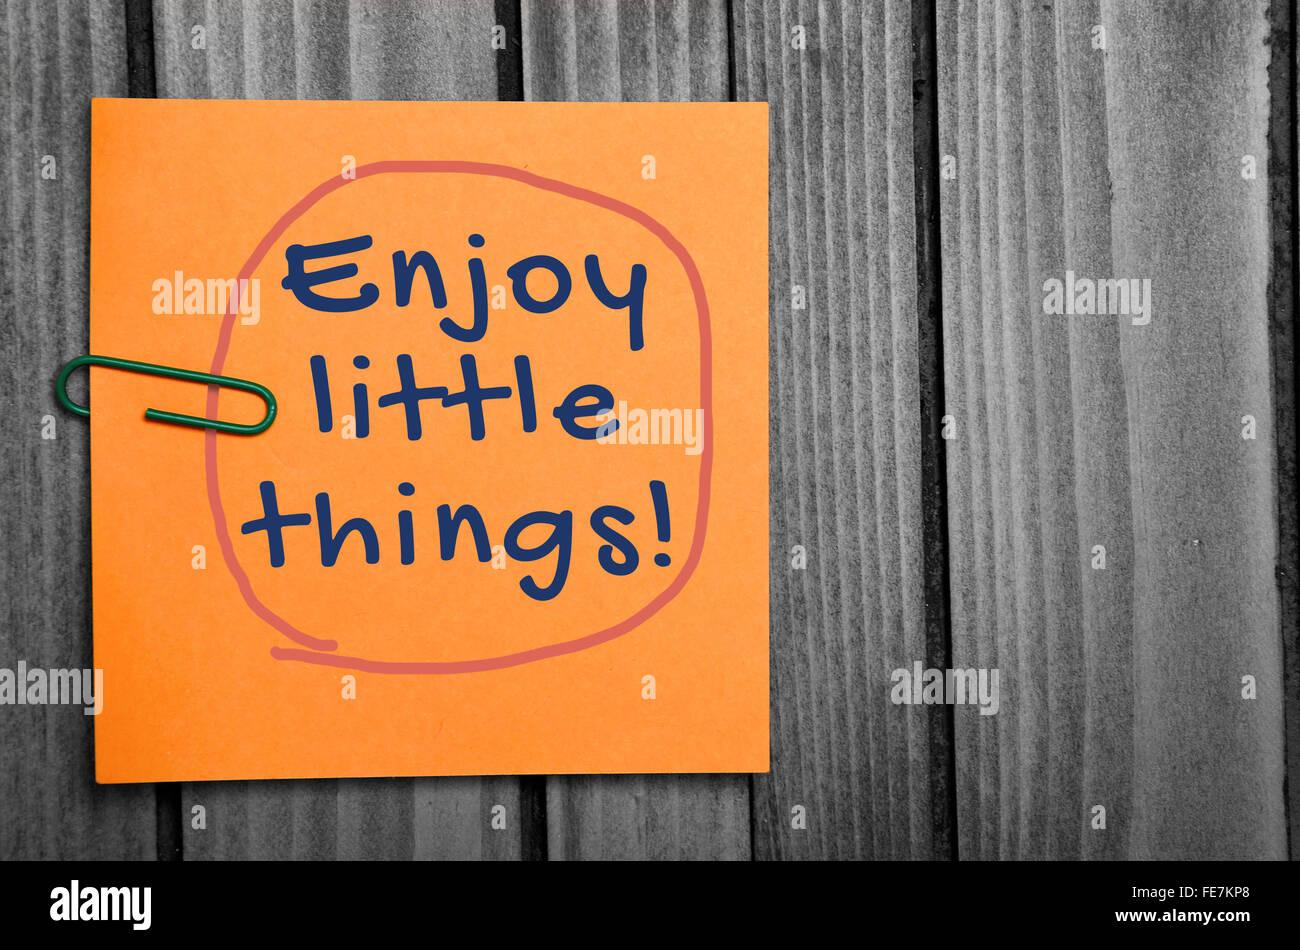 Enjoy little things word on orange notes - Stock Image